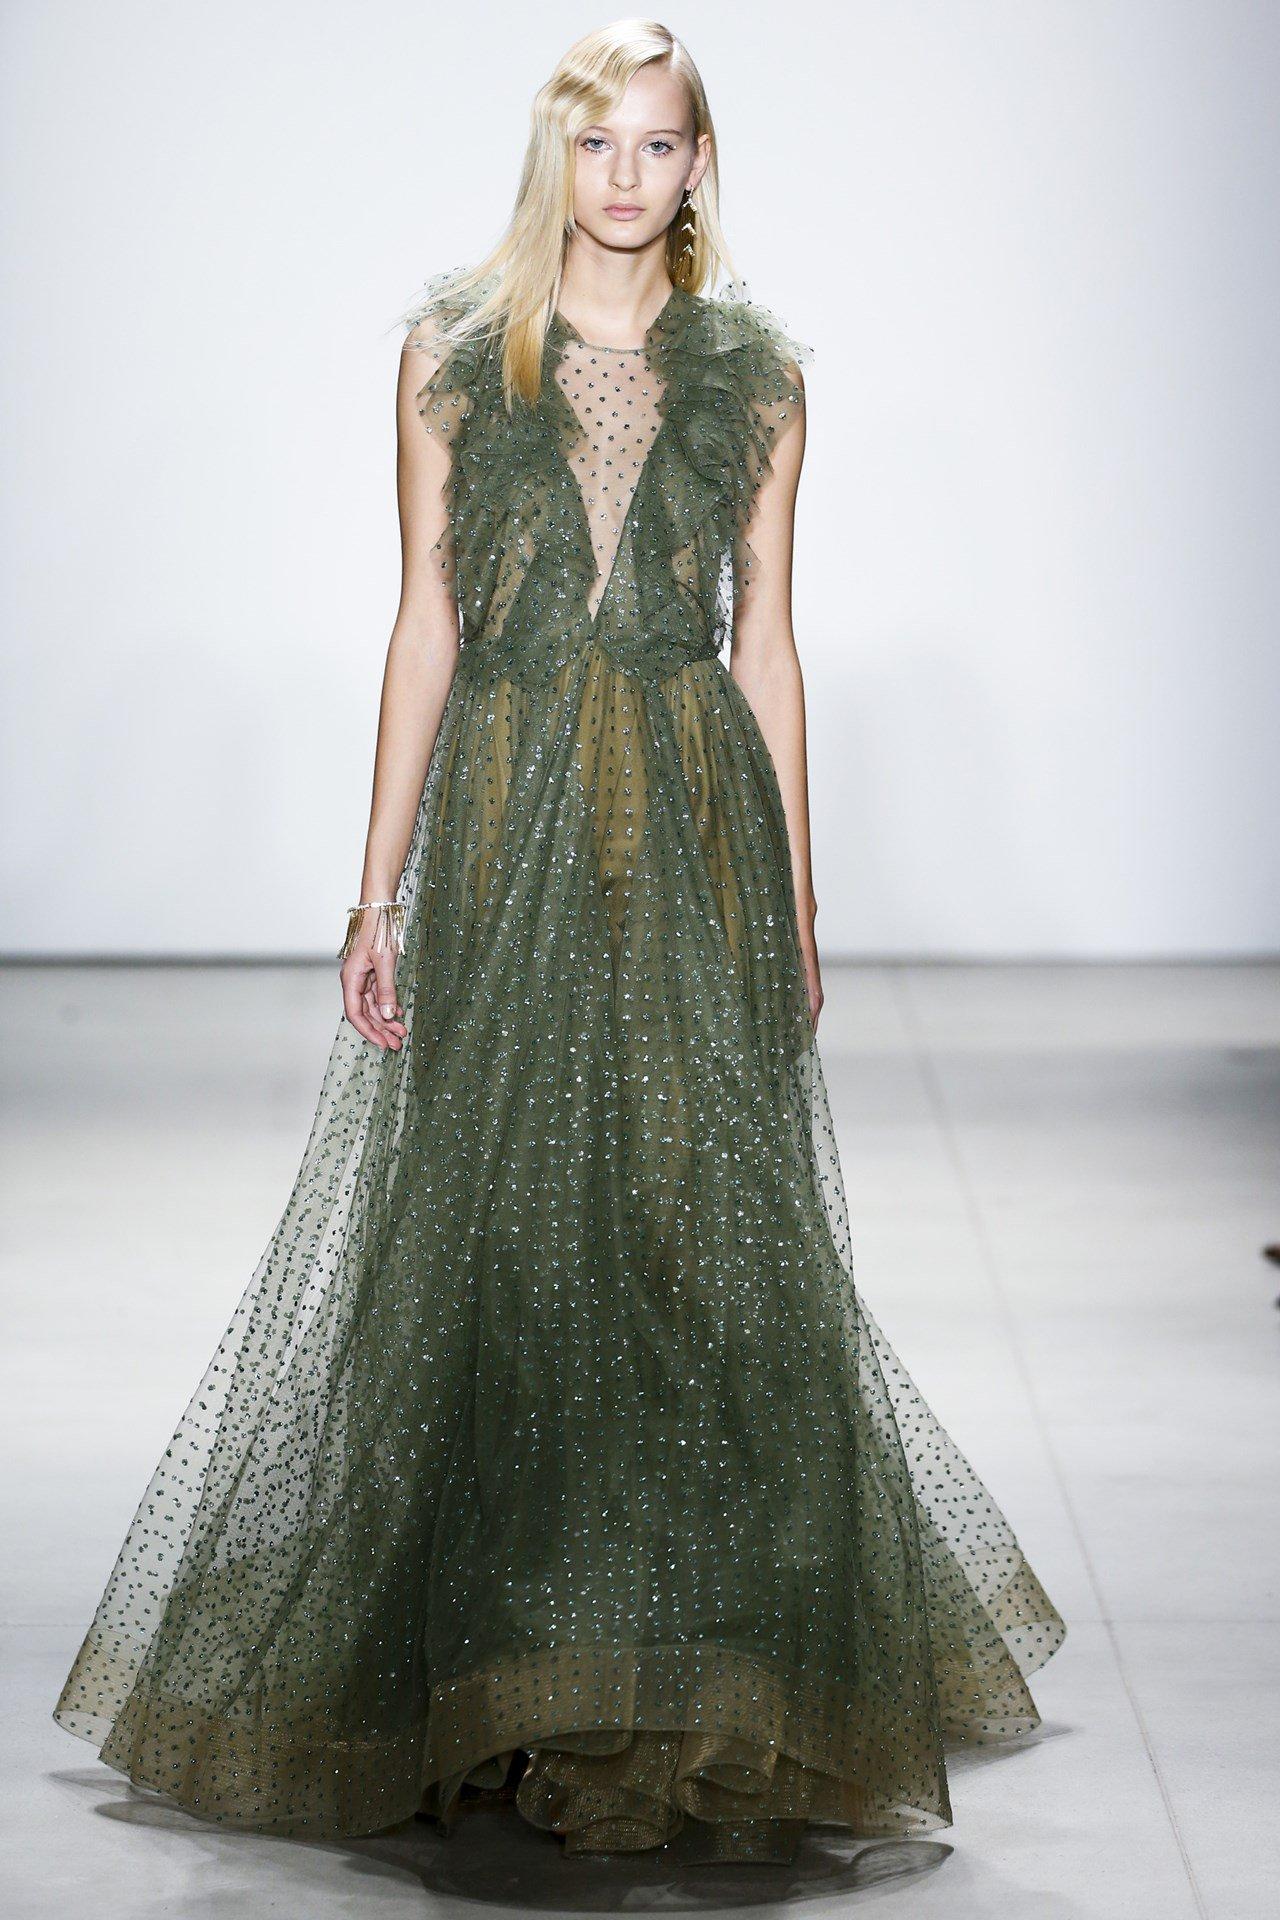 Duchess favourite and bridal queen @JennyPackham joins the fashion debate: https://t.co/KiWzHczAPP https://t.co/5PHK8OSU5M